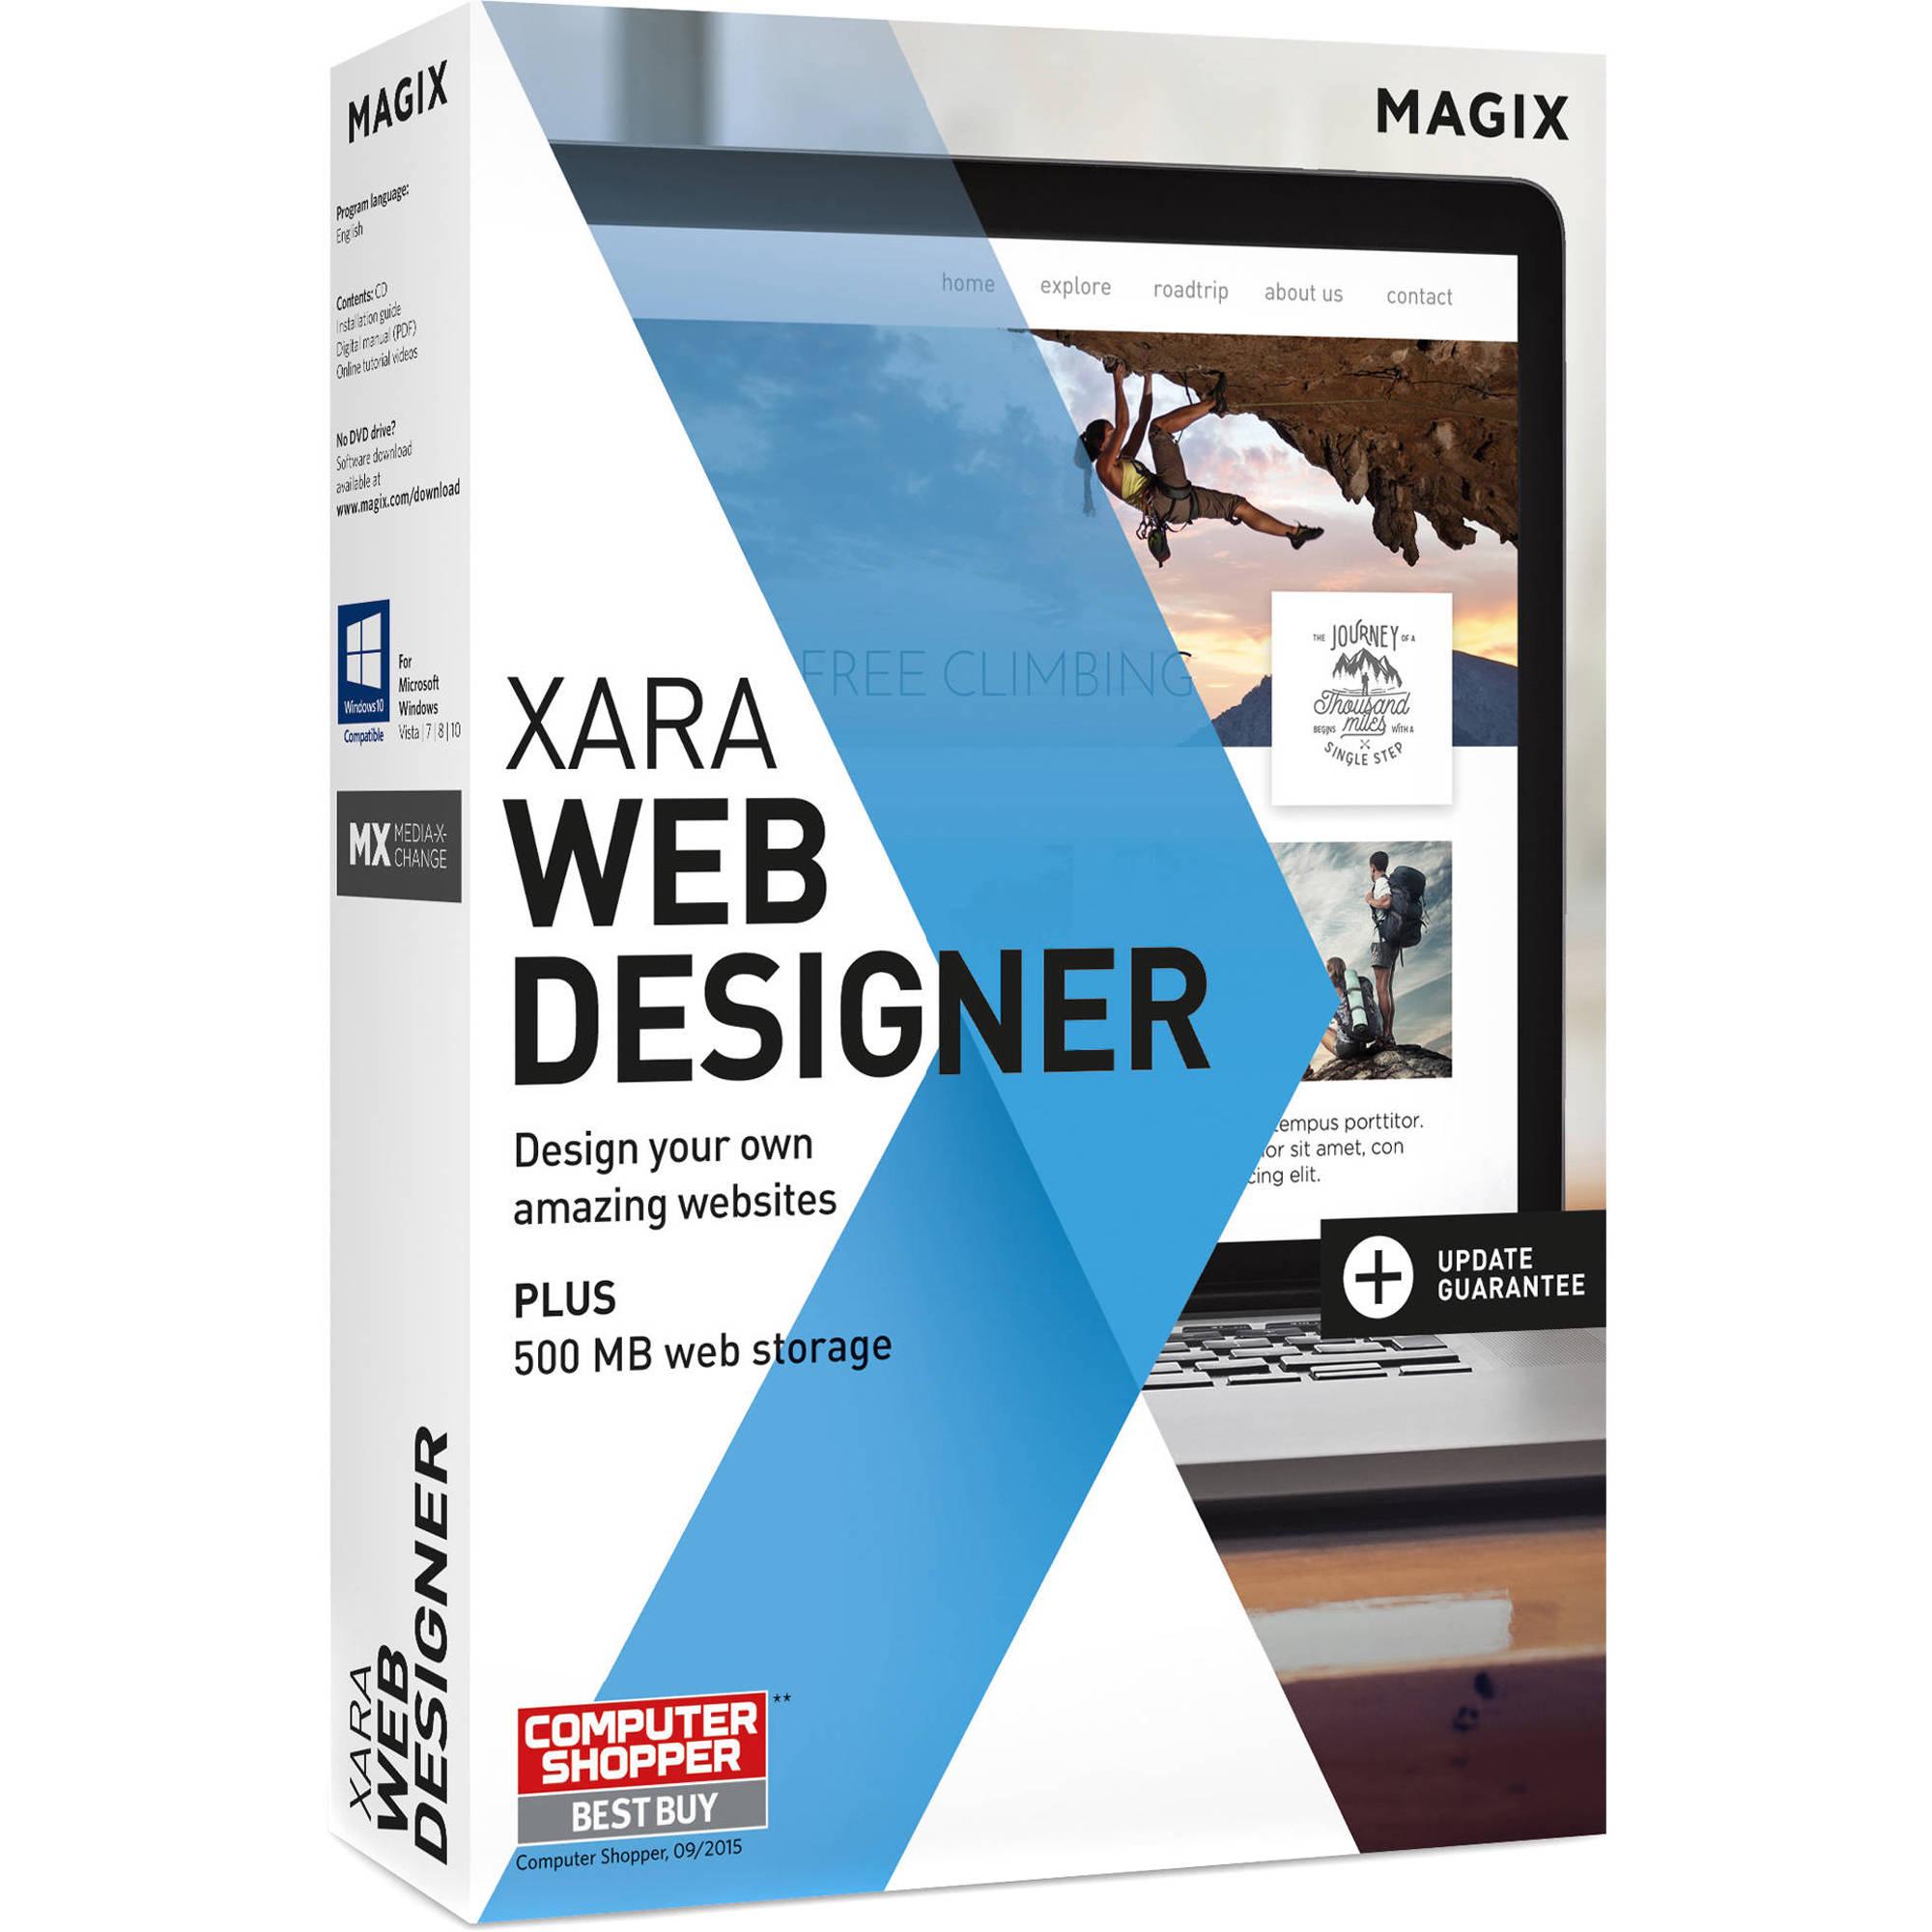 Xara Web Designer Tutorials - oukas.info